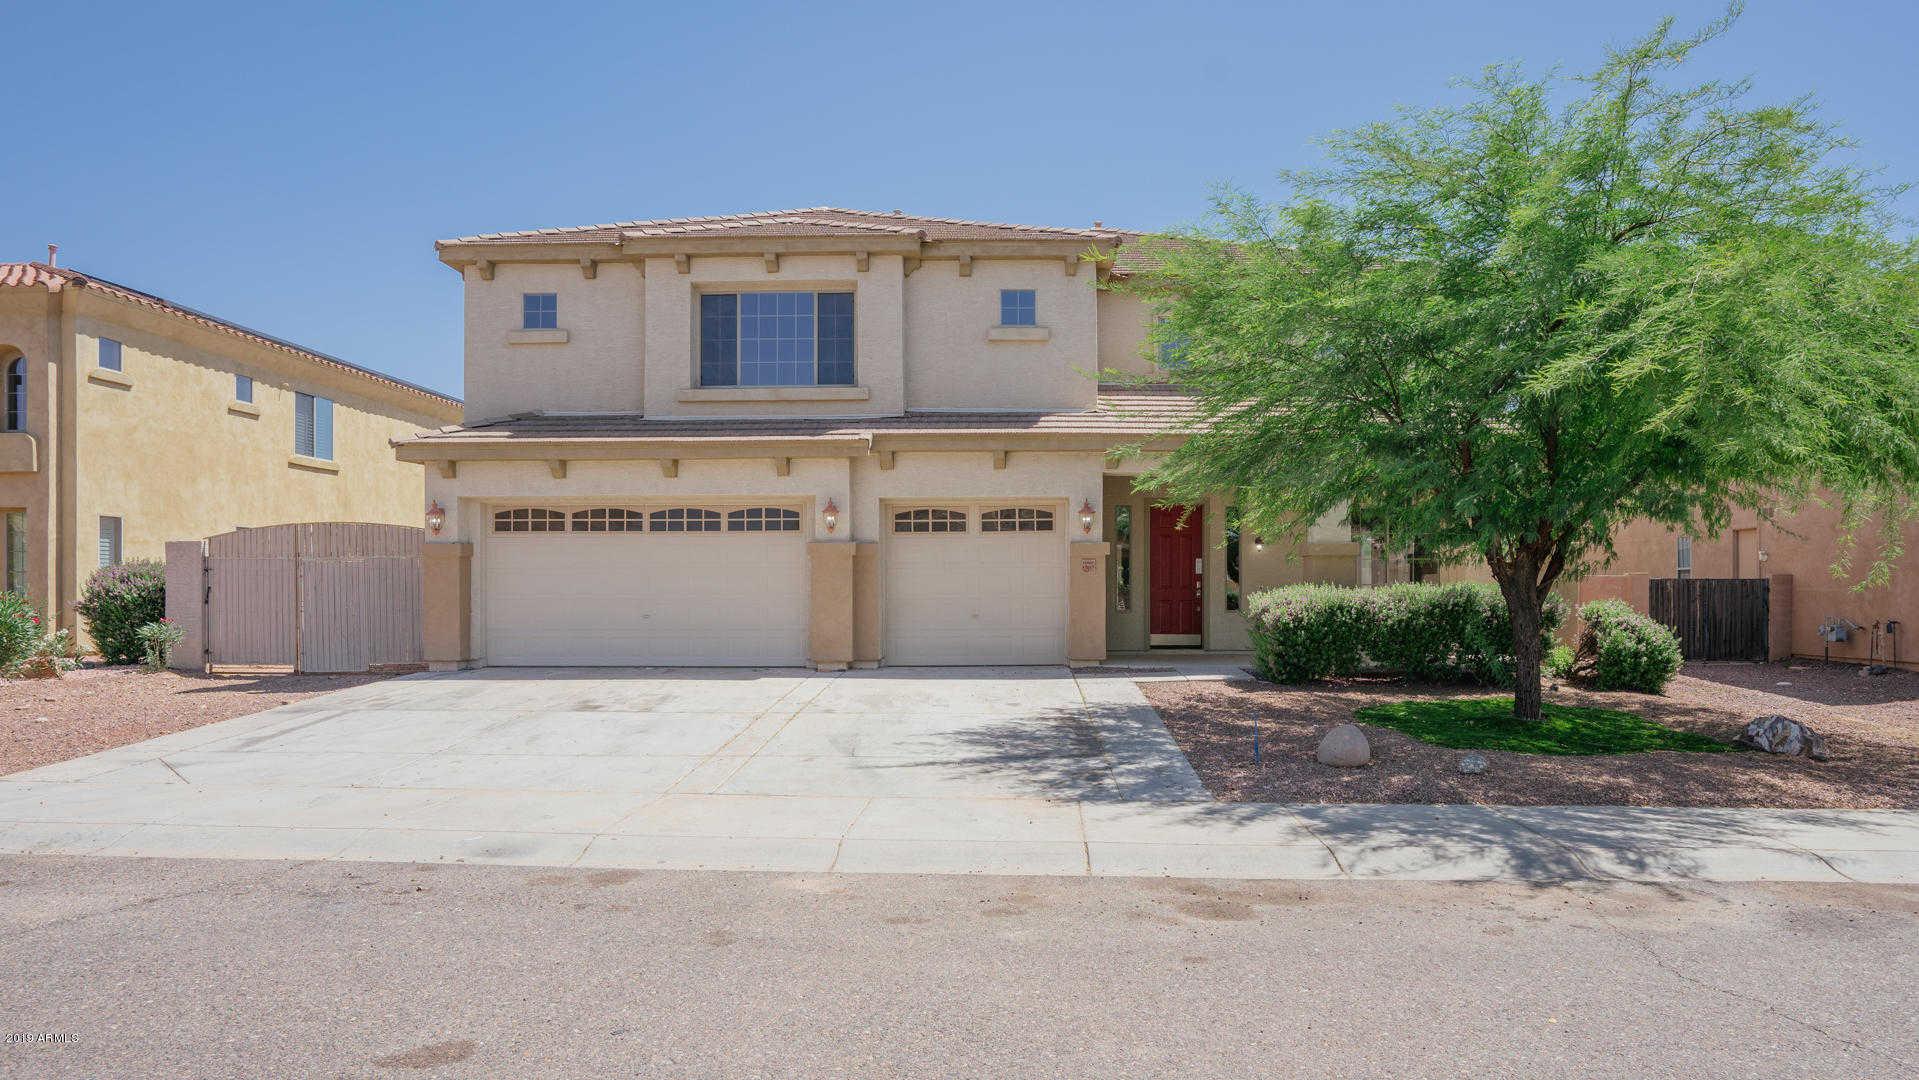 $403,000 - 5Br/3Ba - Home for Sale in Capistrano South, Glendale